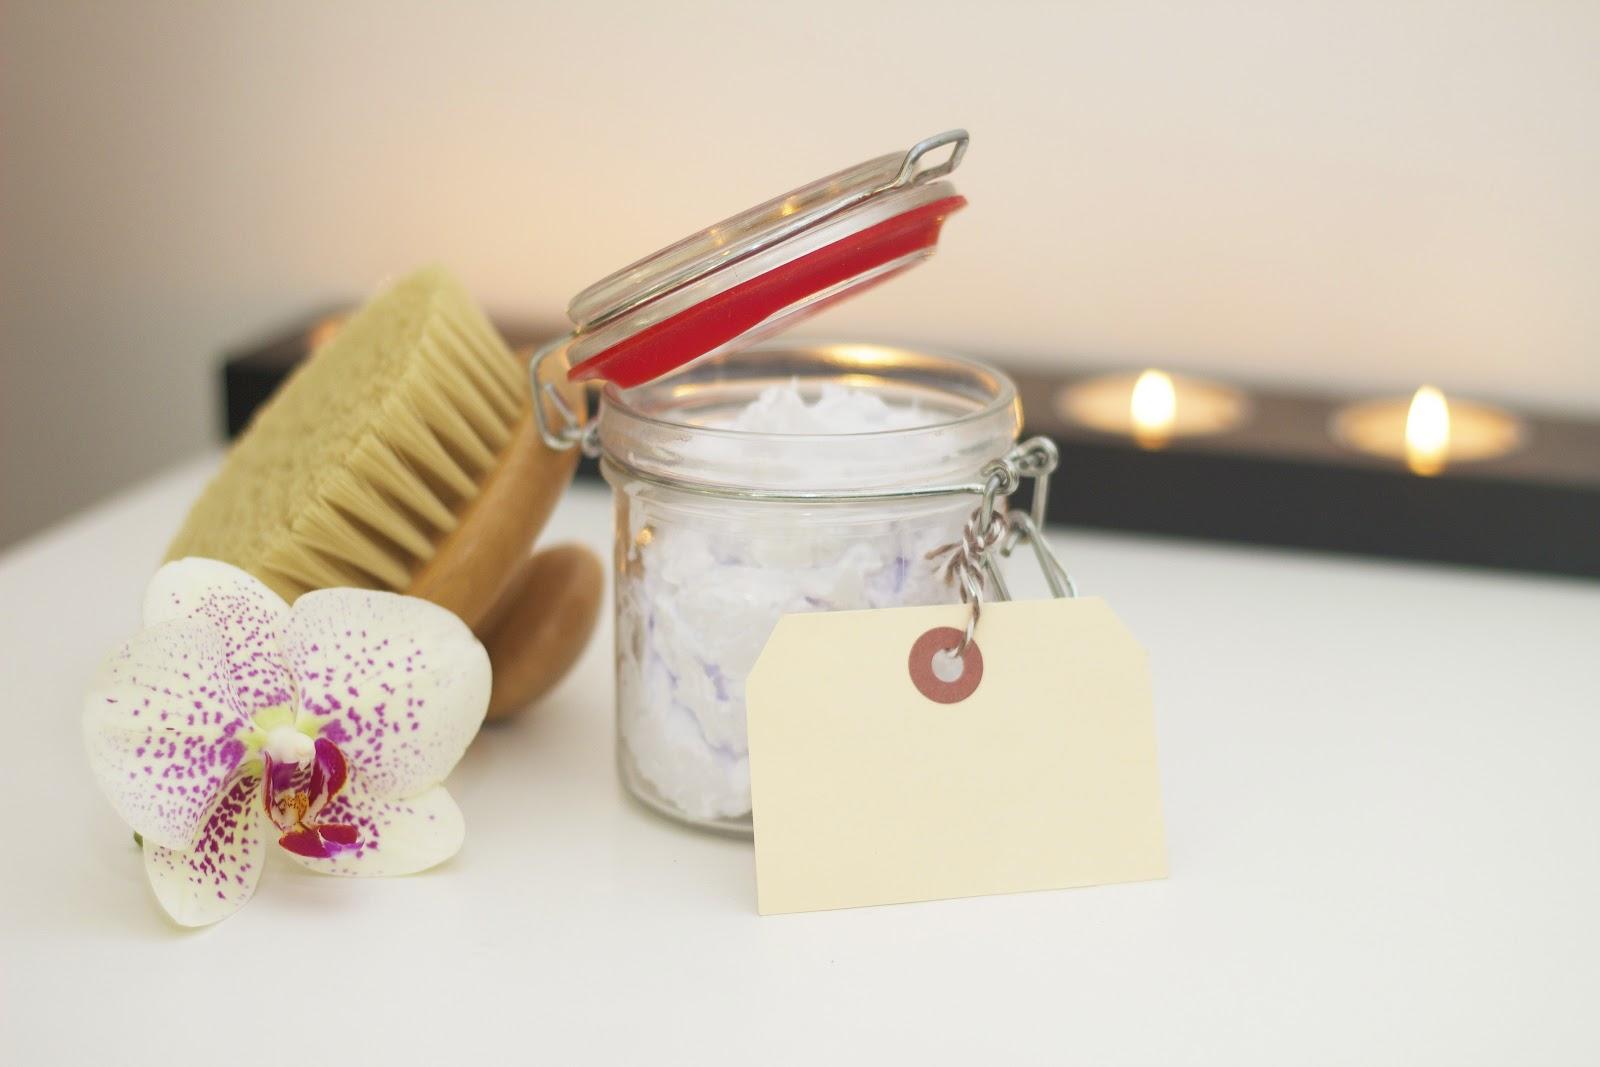 Pampering Ideas For Hardworking Women - Sweet Elyse